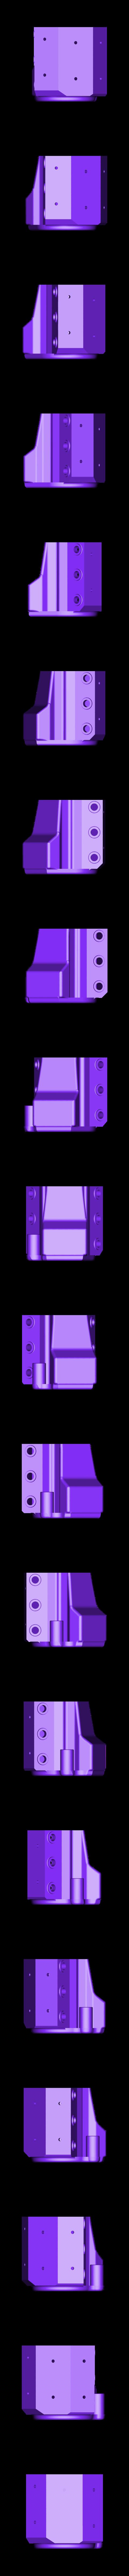 spu34motorshorthollow.stl Download STL file 34' Ford Pickup Hot Rod • 3D printing object, macone1